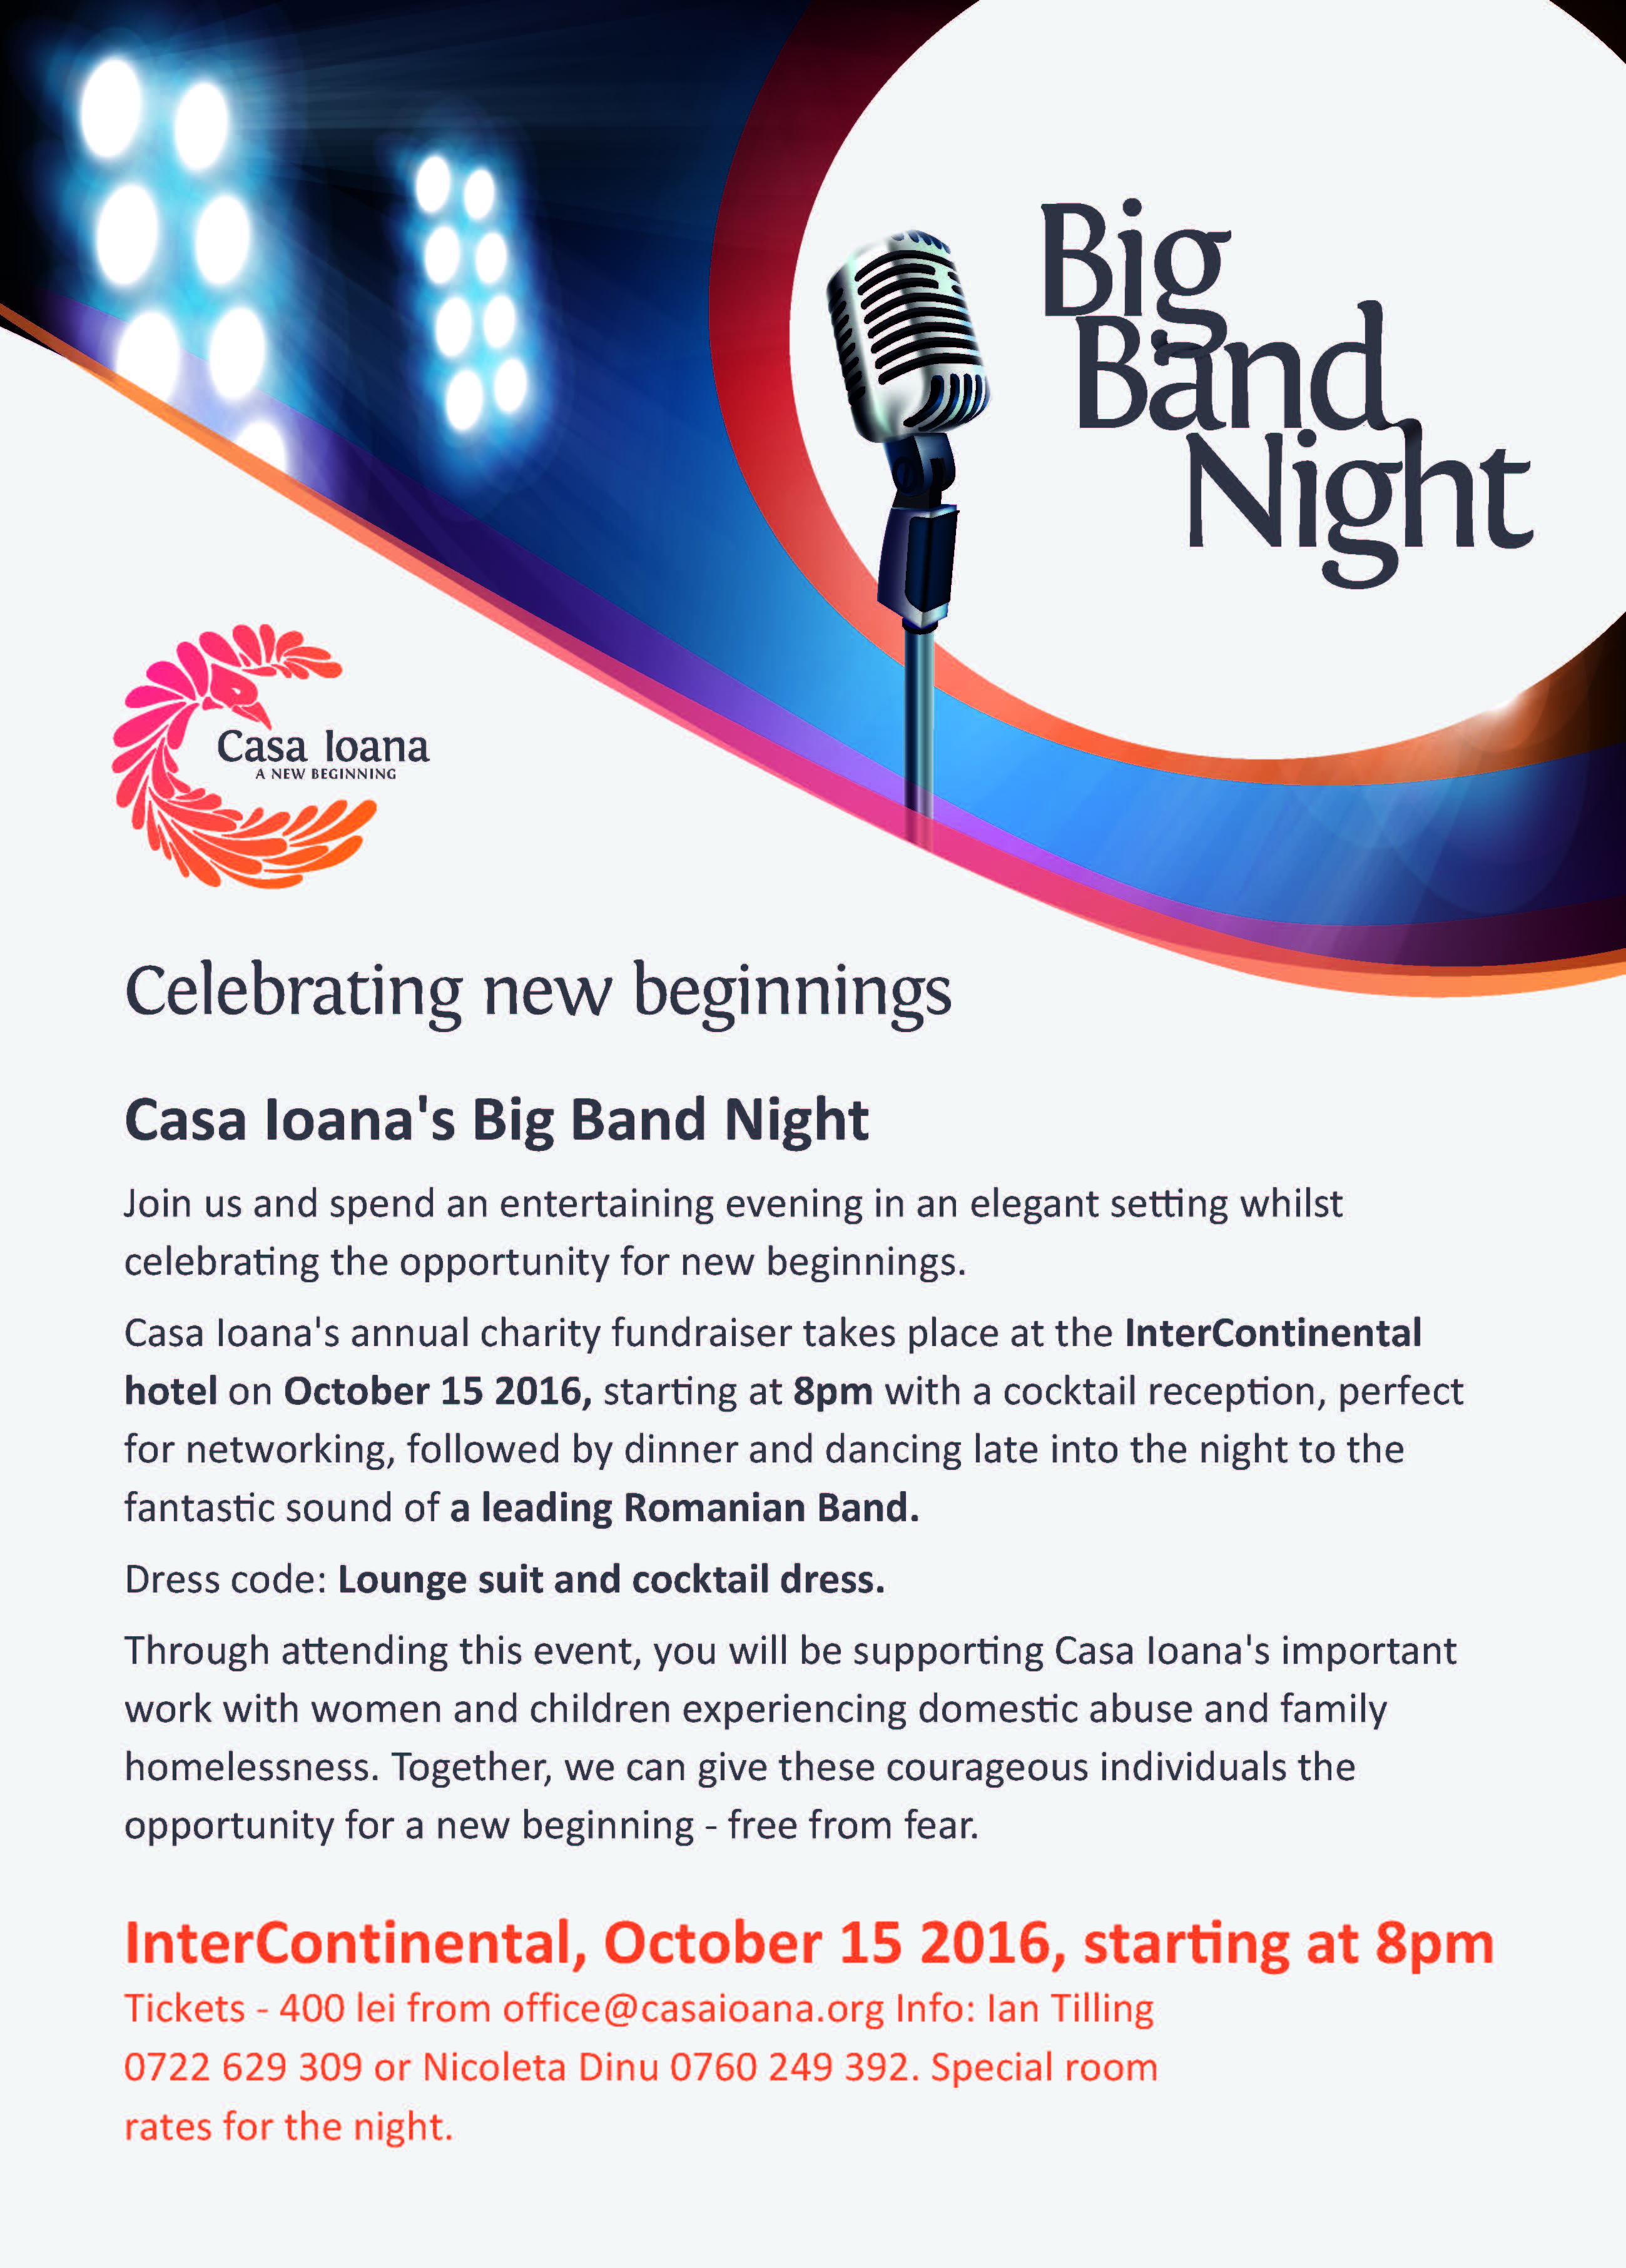 Casa Ioana's Big Band Night @ Intercontinental Hotel